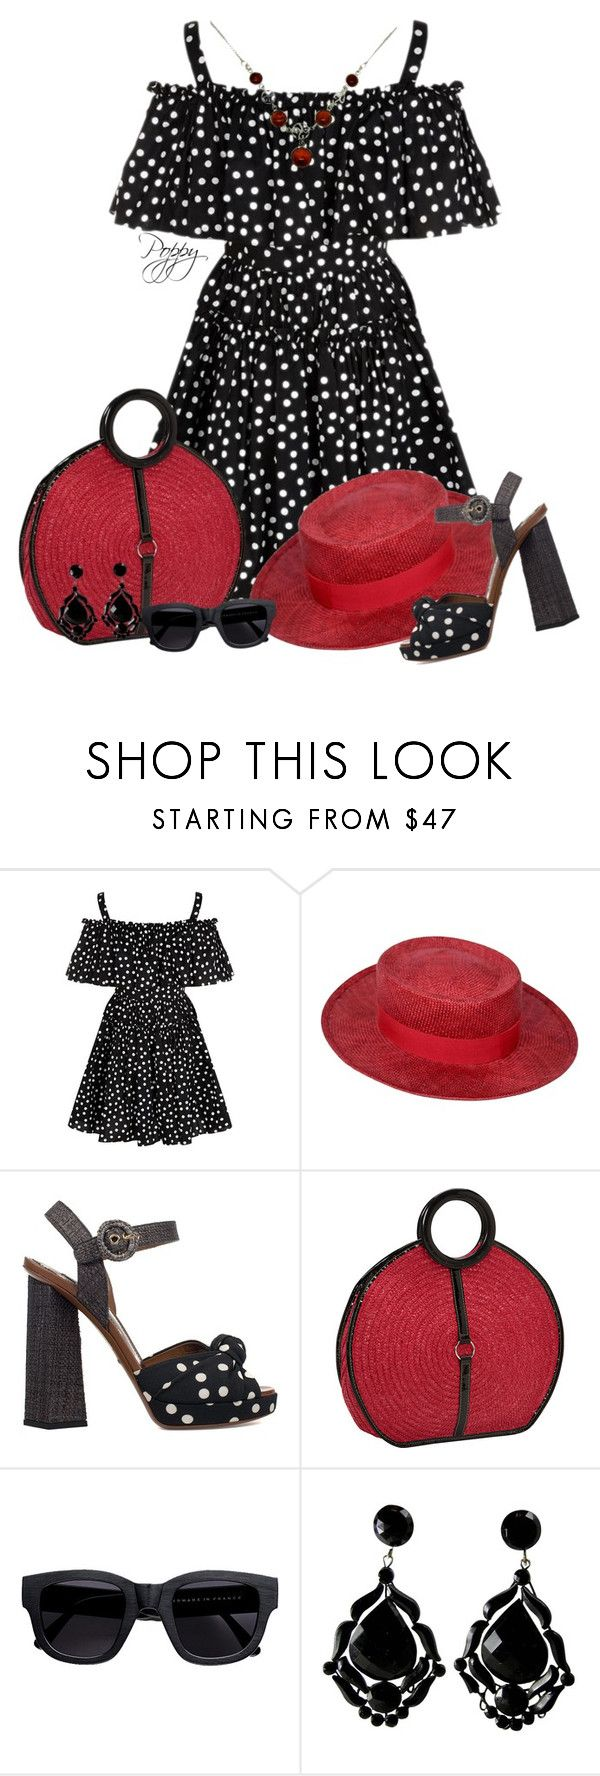 """Polka Dot Mini"" by bainbridgegal ❤ liked on Polyvore featuring Dolce&Gabbana, Chanel, Magid, Acne Studios and Goldmajor"